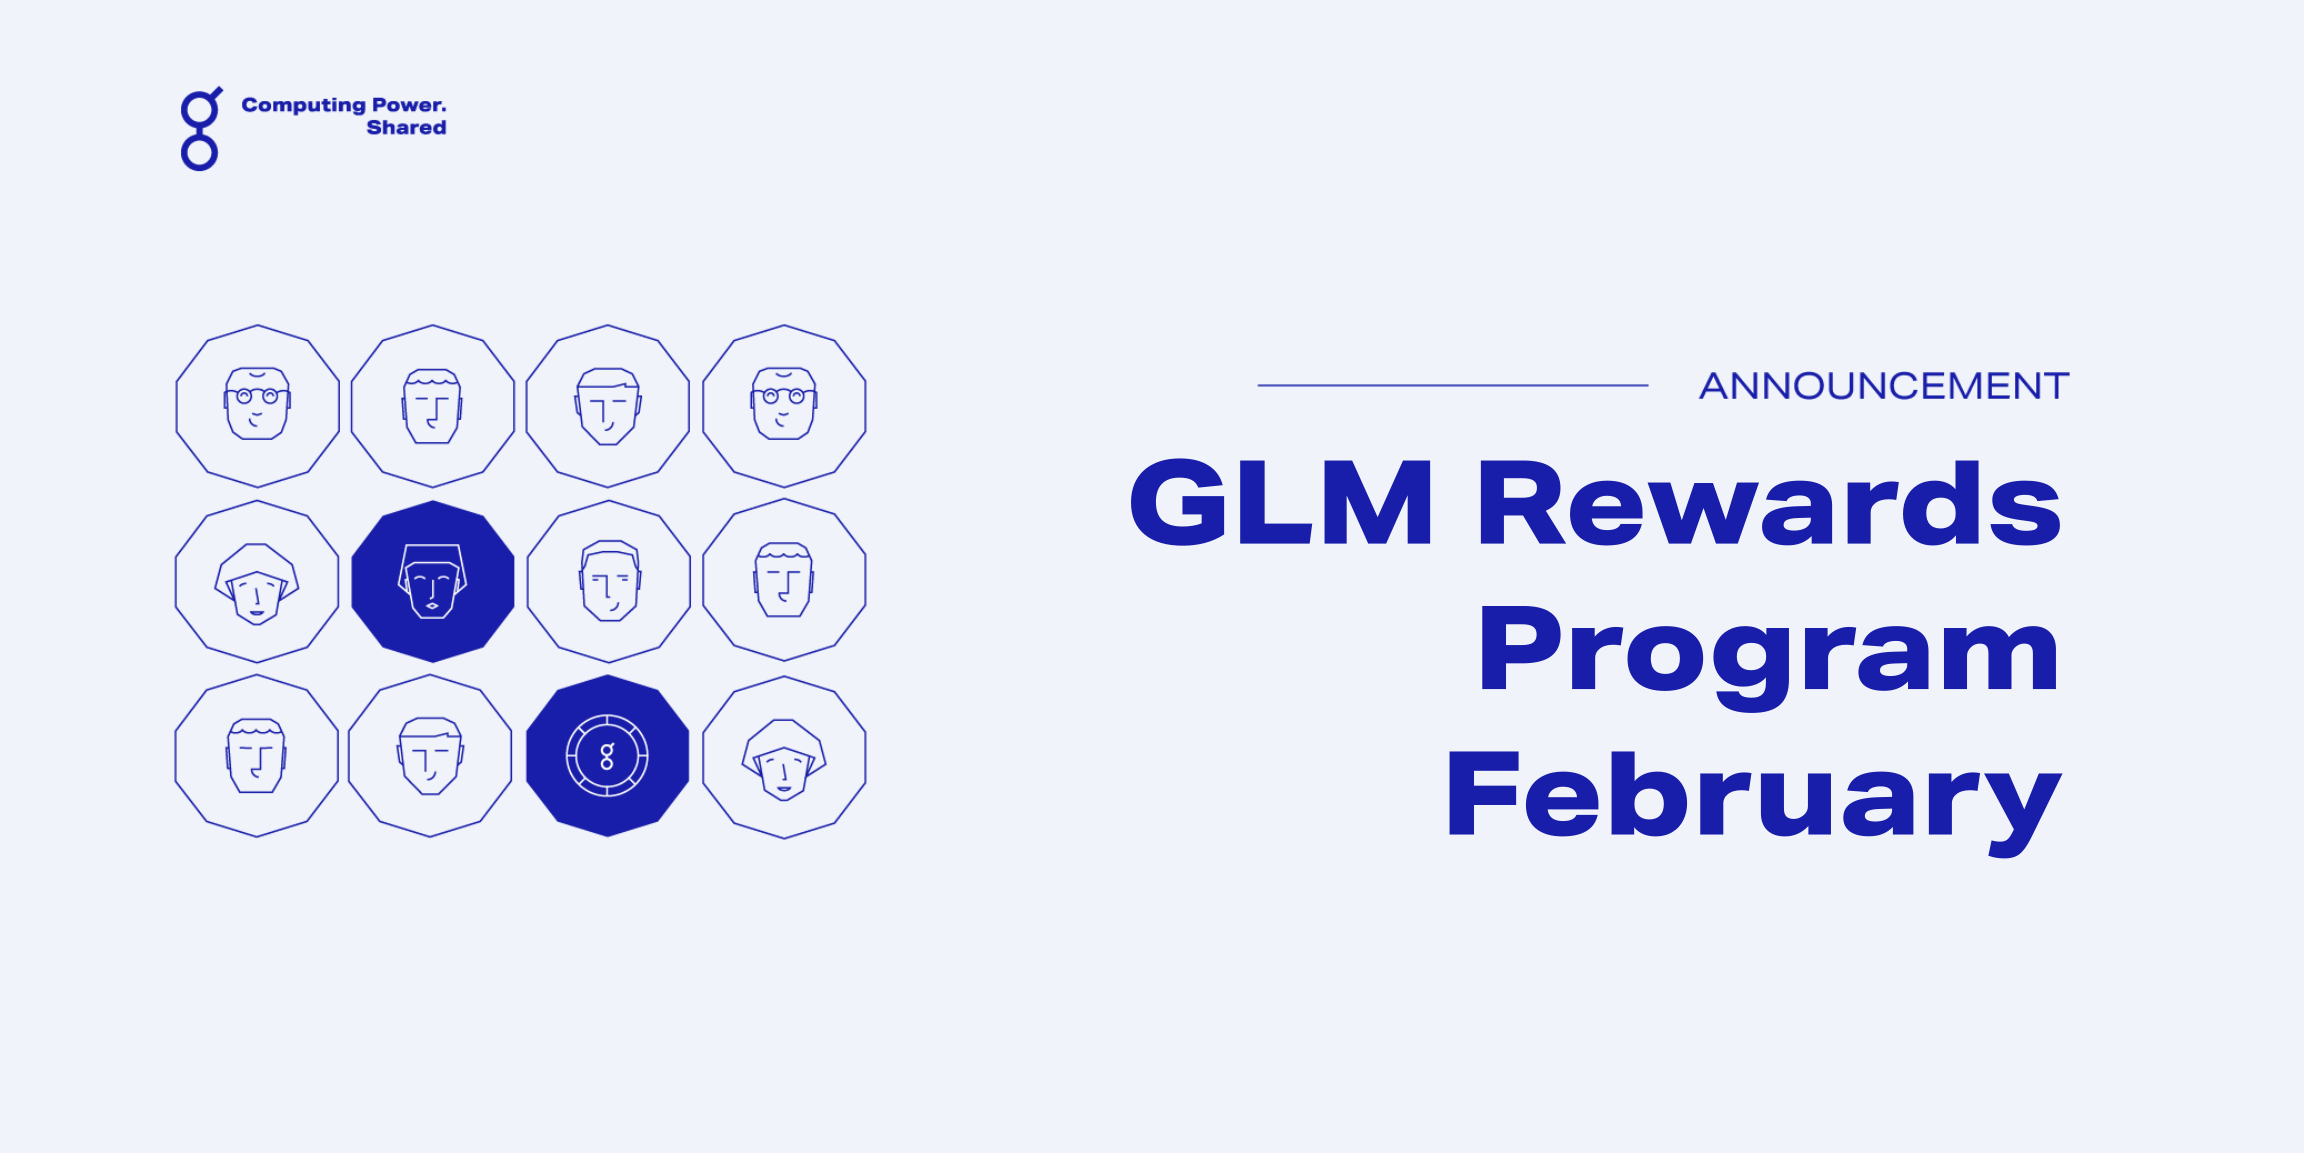 GLM Rewards Program February Update